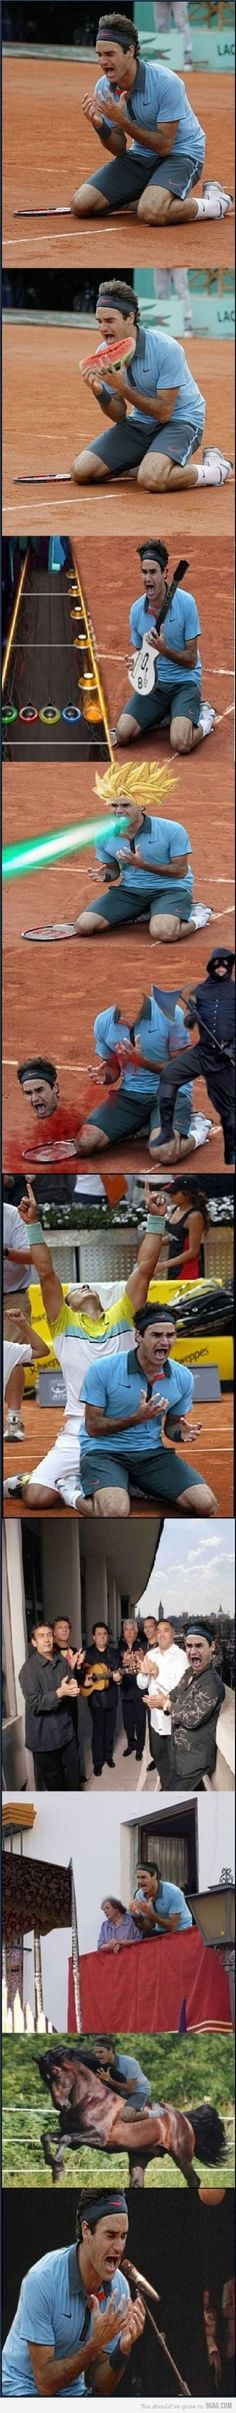 Roger Federer by reirhart_luna - A Member of the Internet's Largest Humor Community